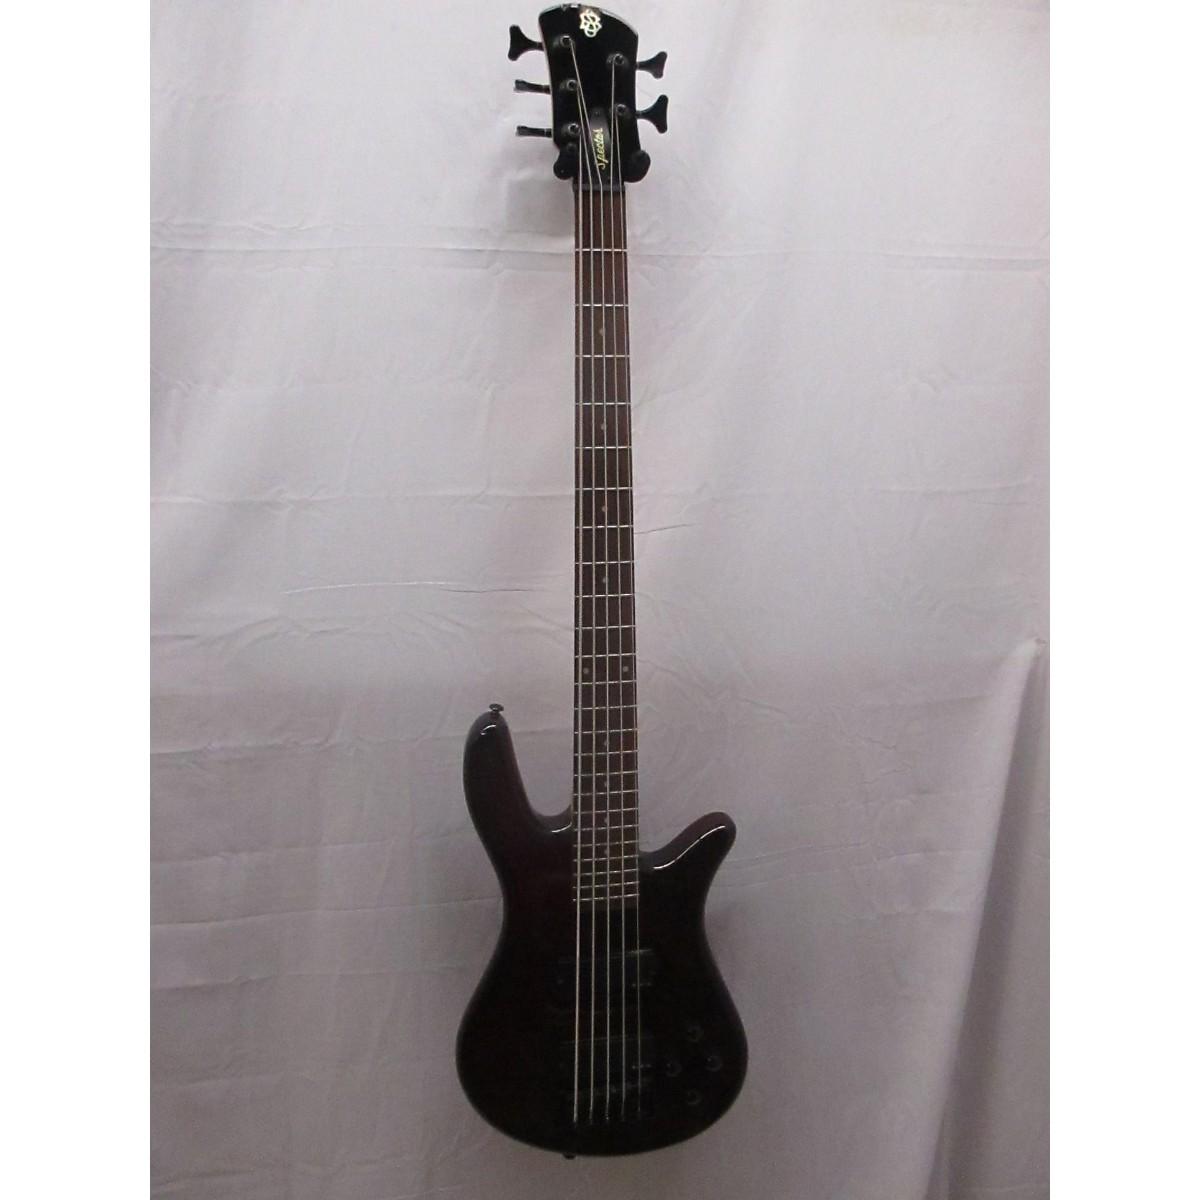 Spector Performer 5 Electric Bass Guitar